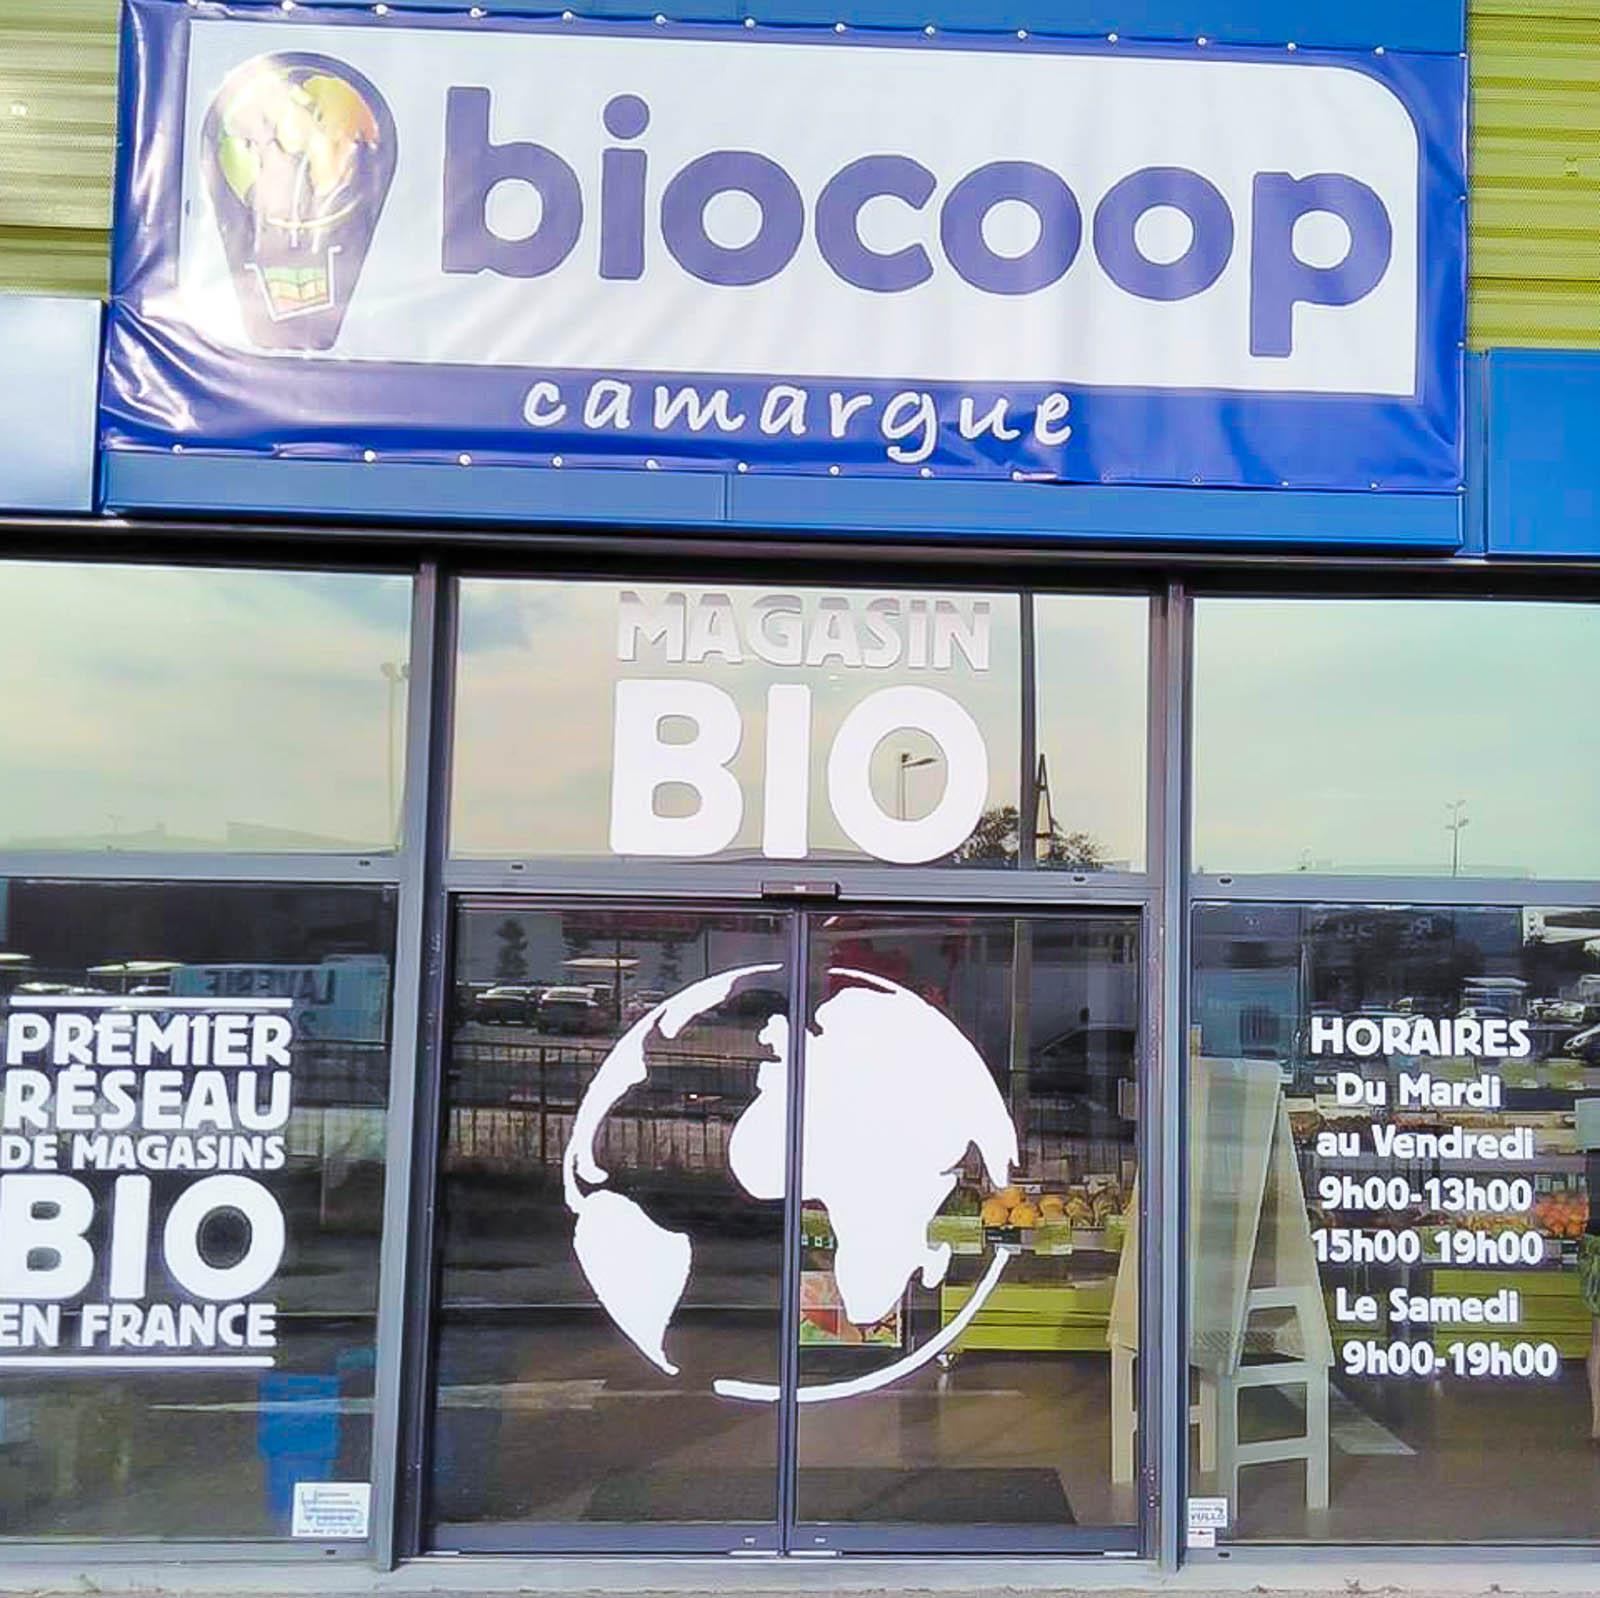 biocoop arles camargue